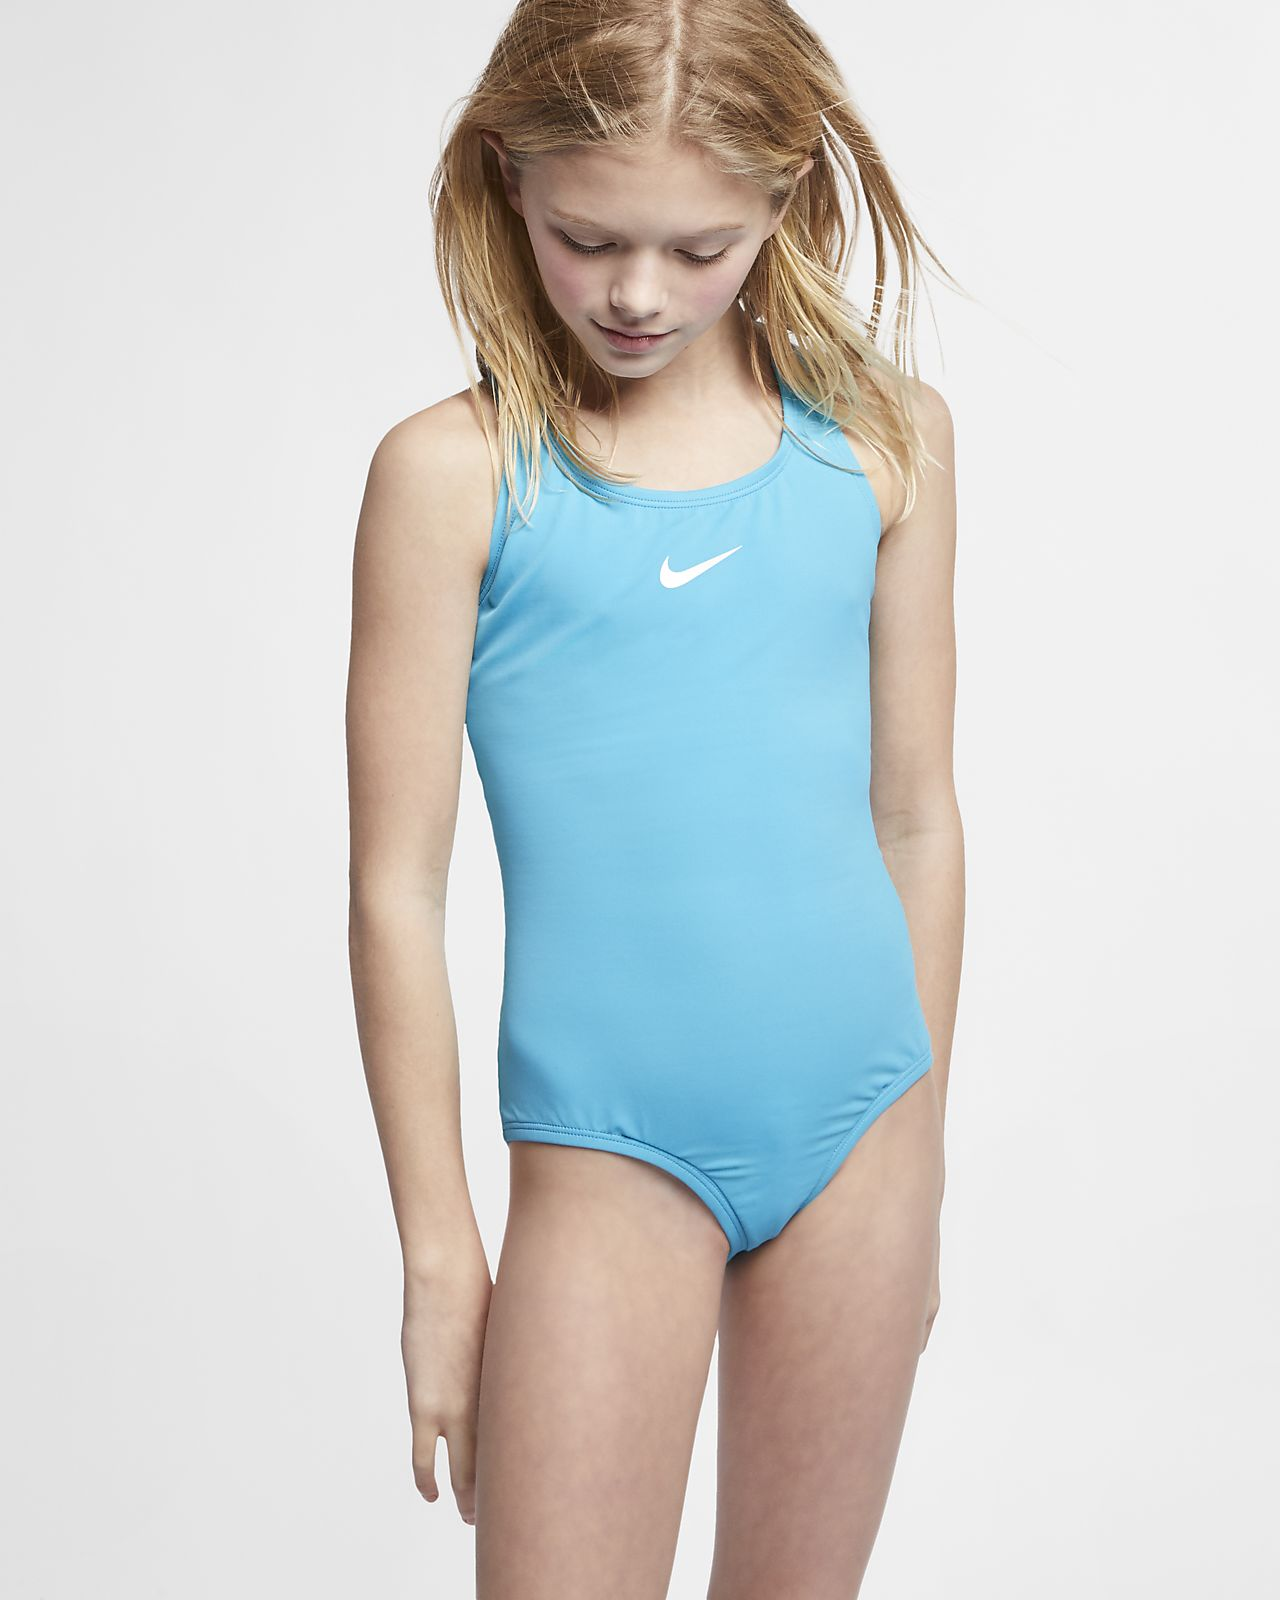 095c15149cf47 Nike Solid Racerback Big Kids' (Girls') Two-Piece Swimsuit. Nike.com